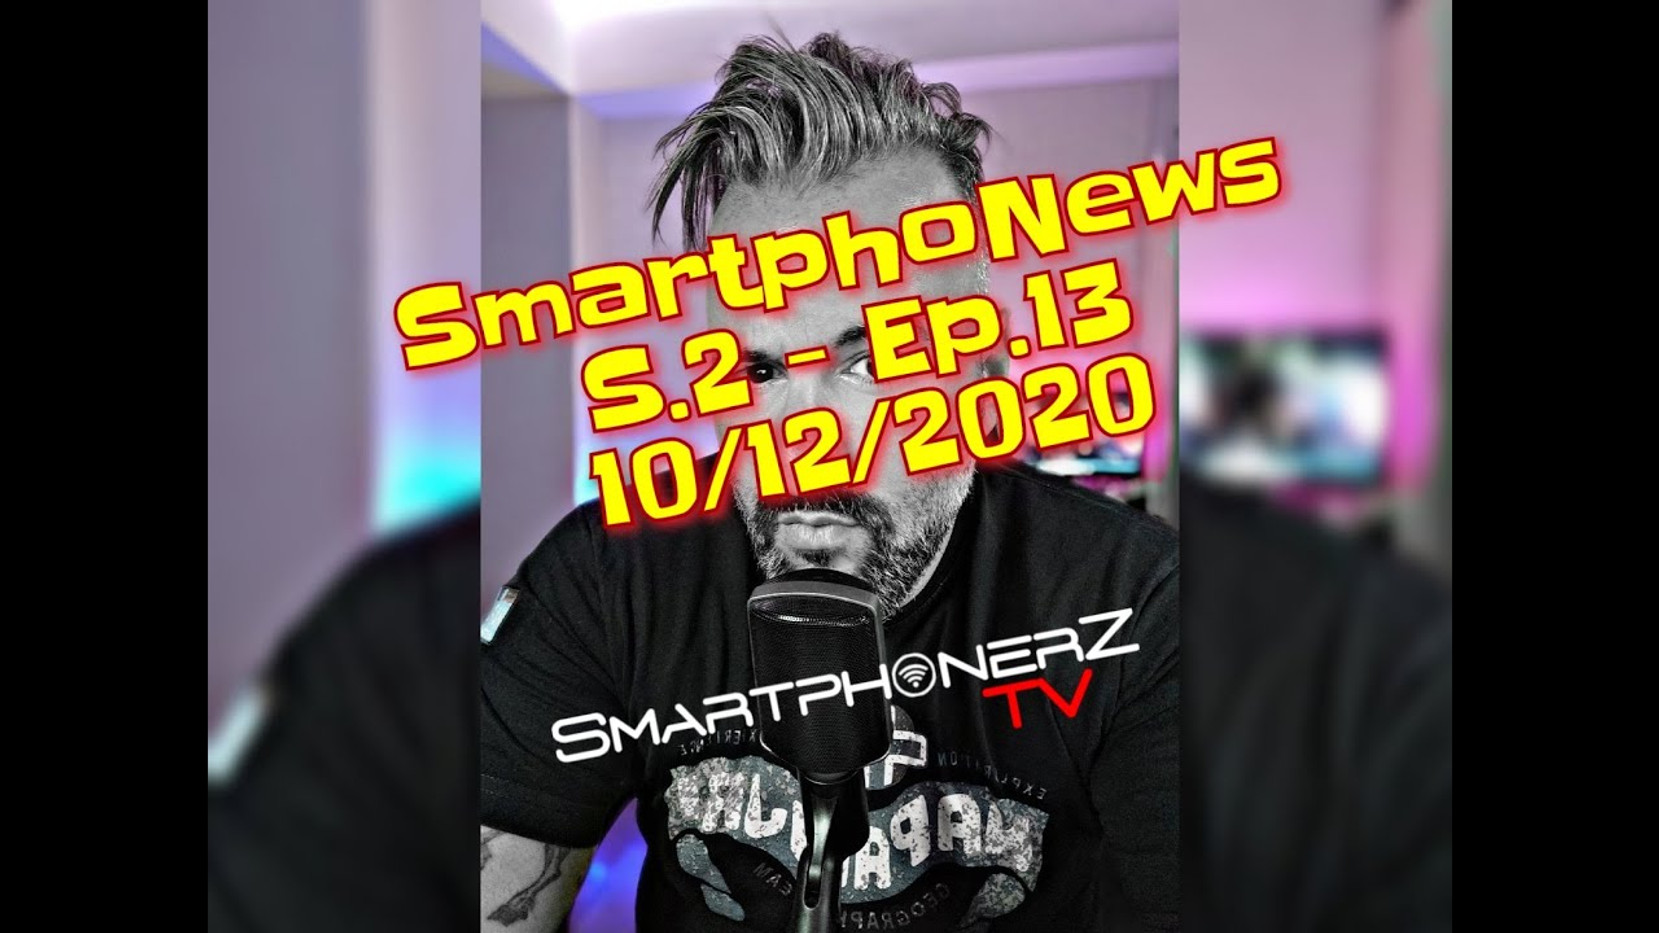 SmartphoNews S.2 - Ep.13